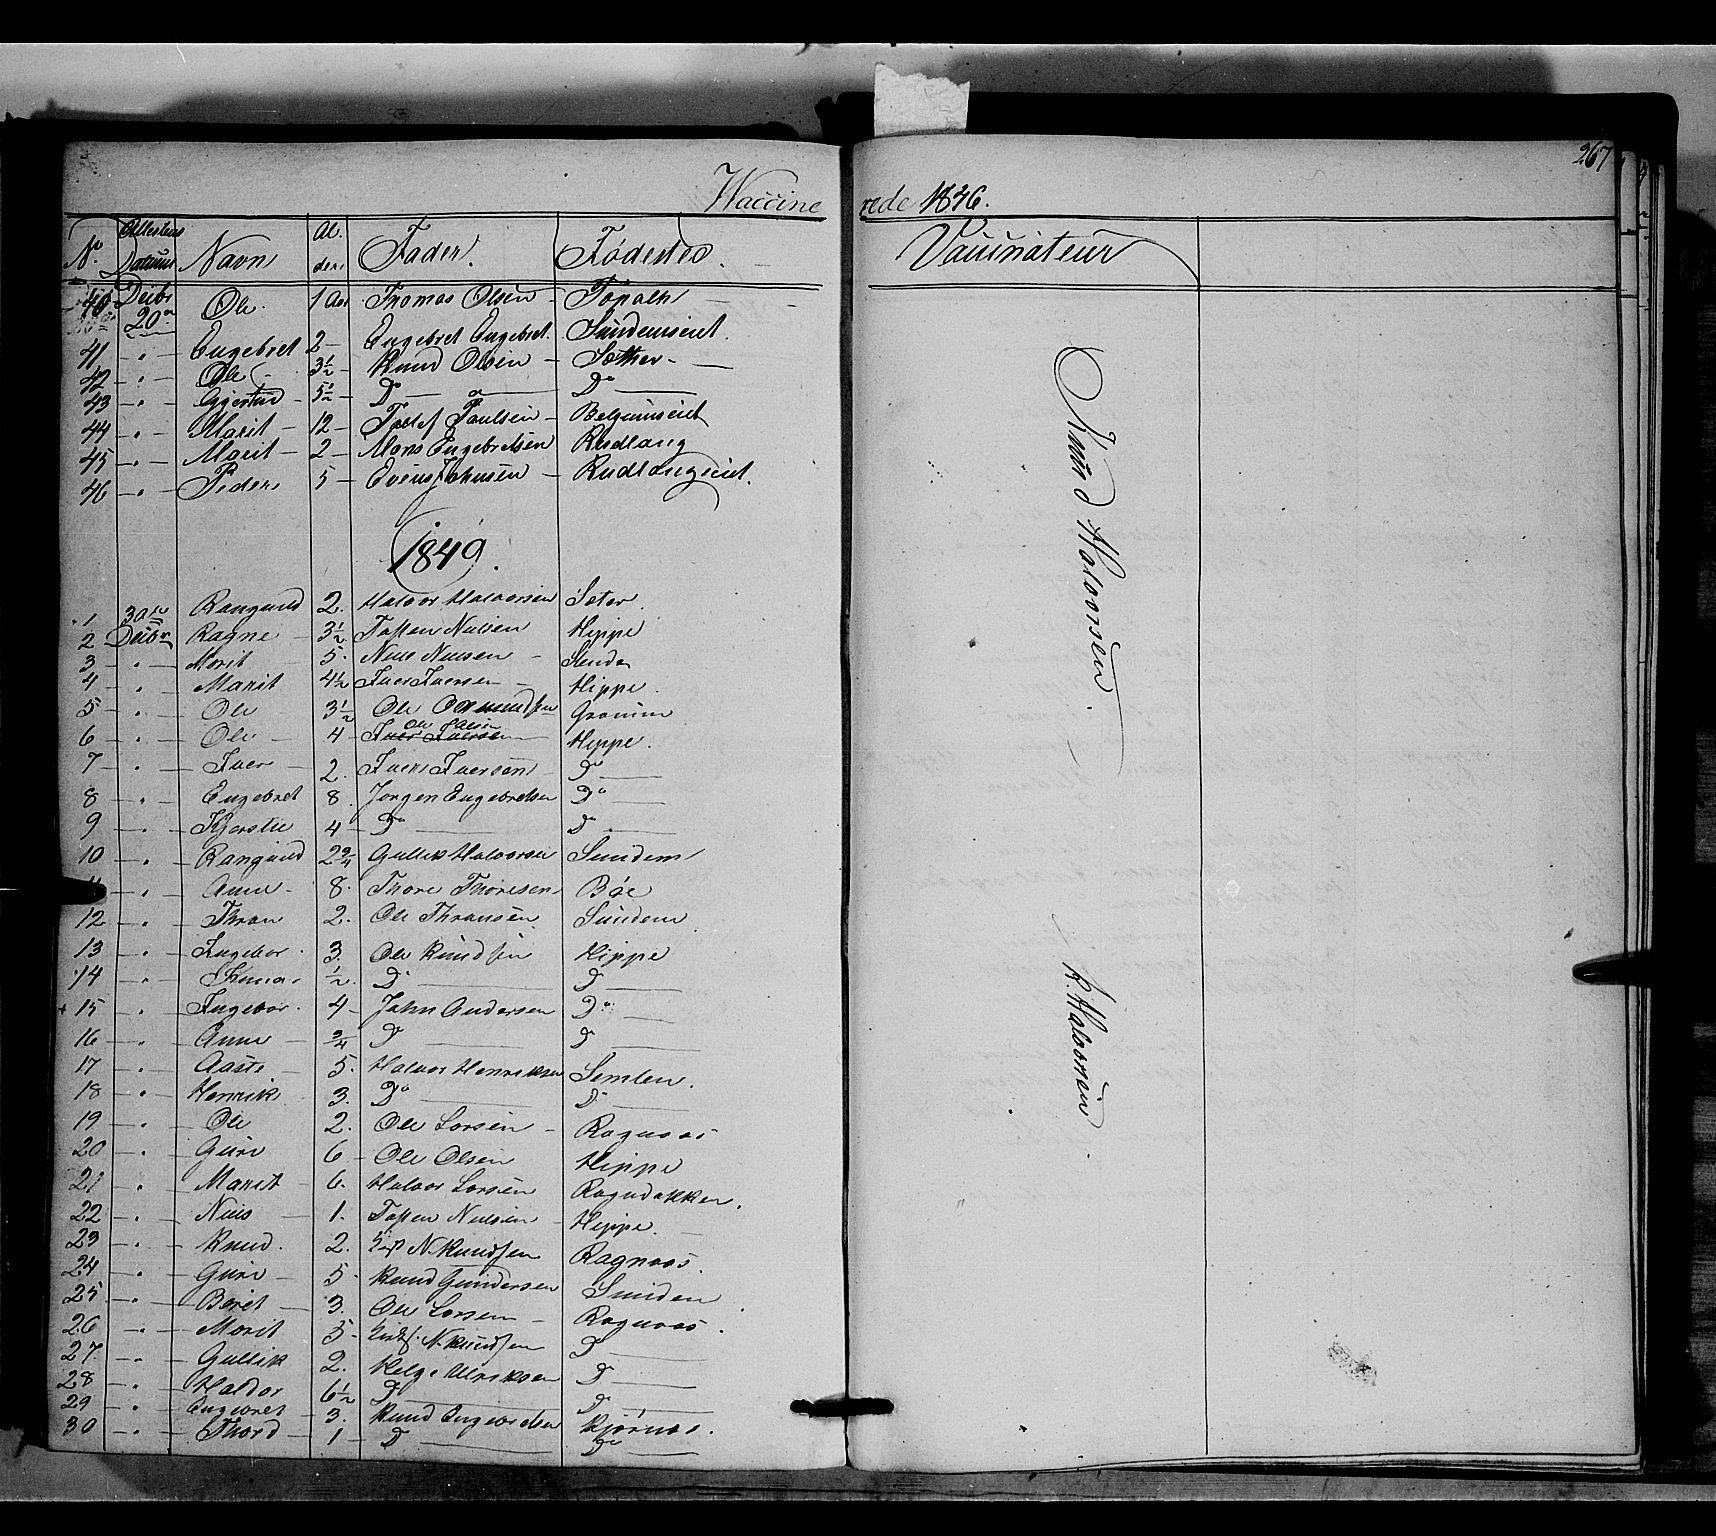 SAH, Nord-Aurdal prestekontor, Ministerialbok nr. 6, 1842-1863, s. 267